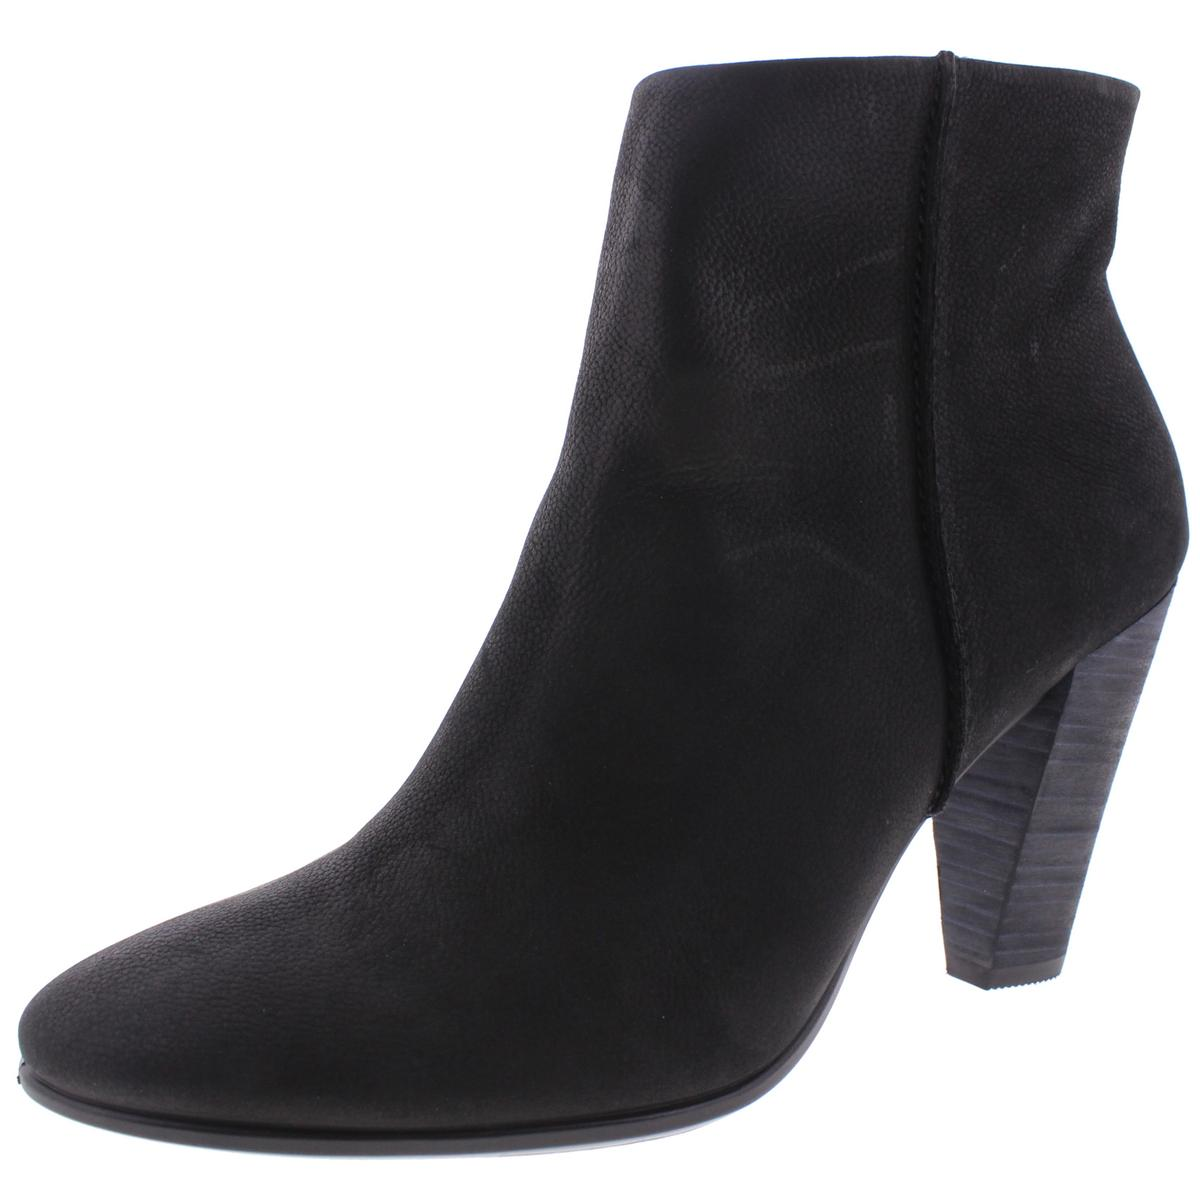 ECCO Womens Shape 75 Nubuck Heel Booties by Ecco